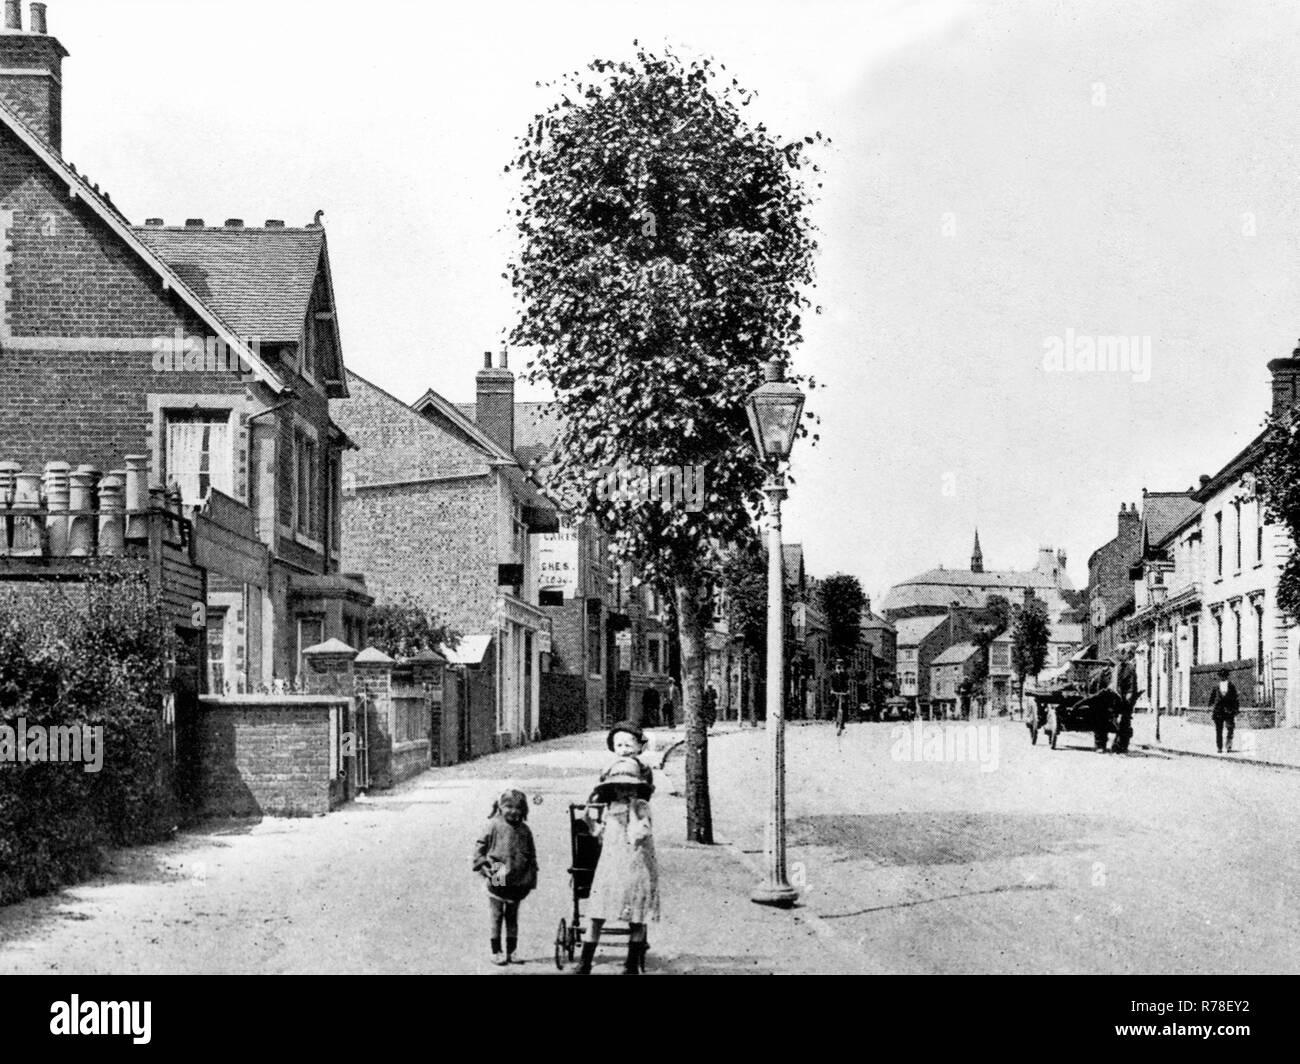 Station Road, Market Harborough - Stock Image